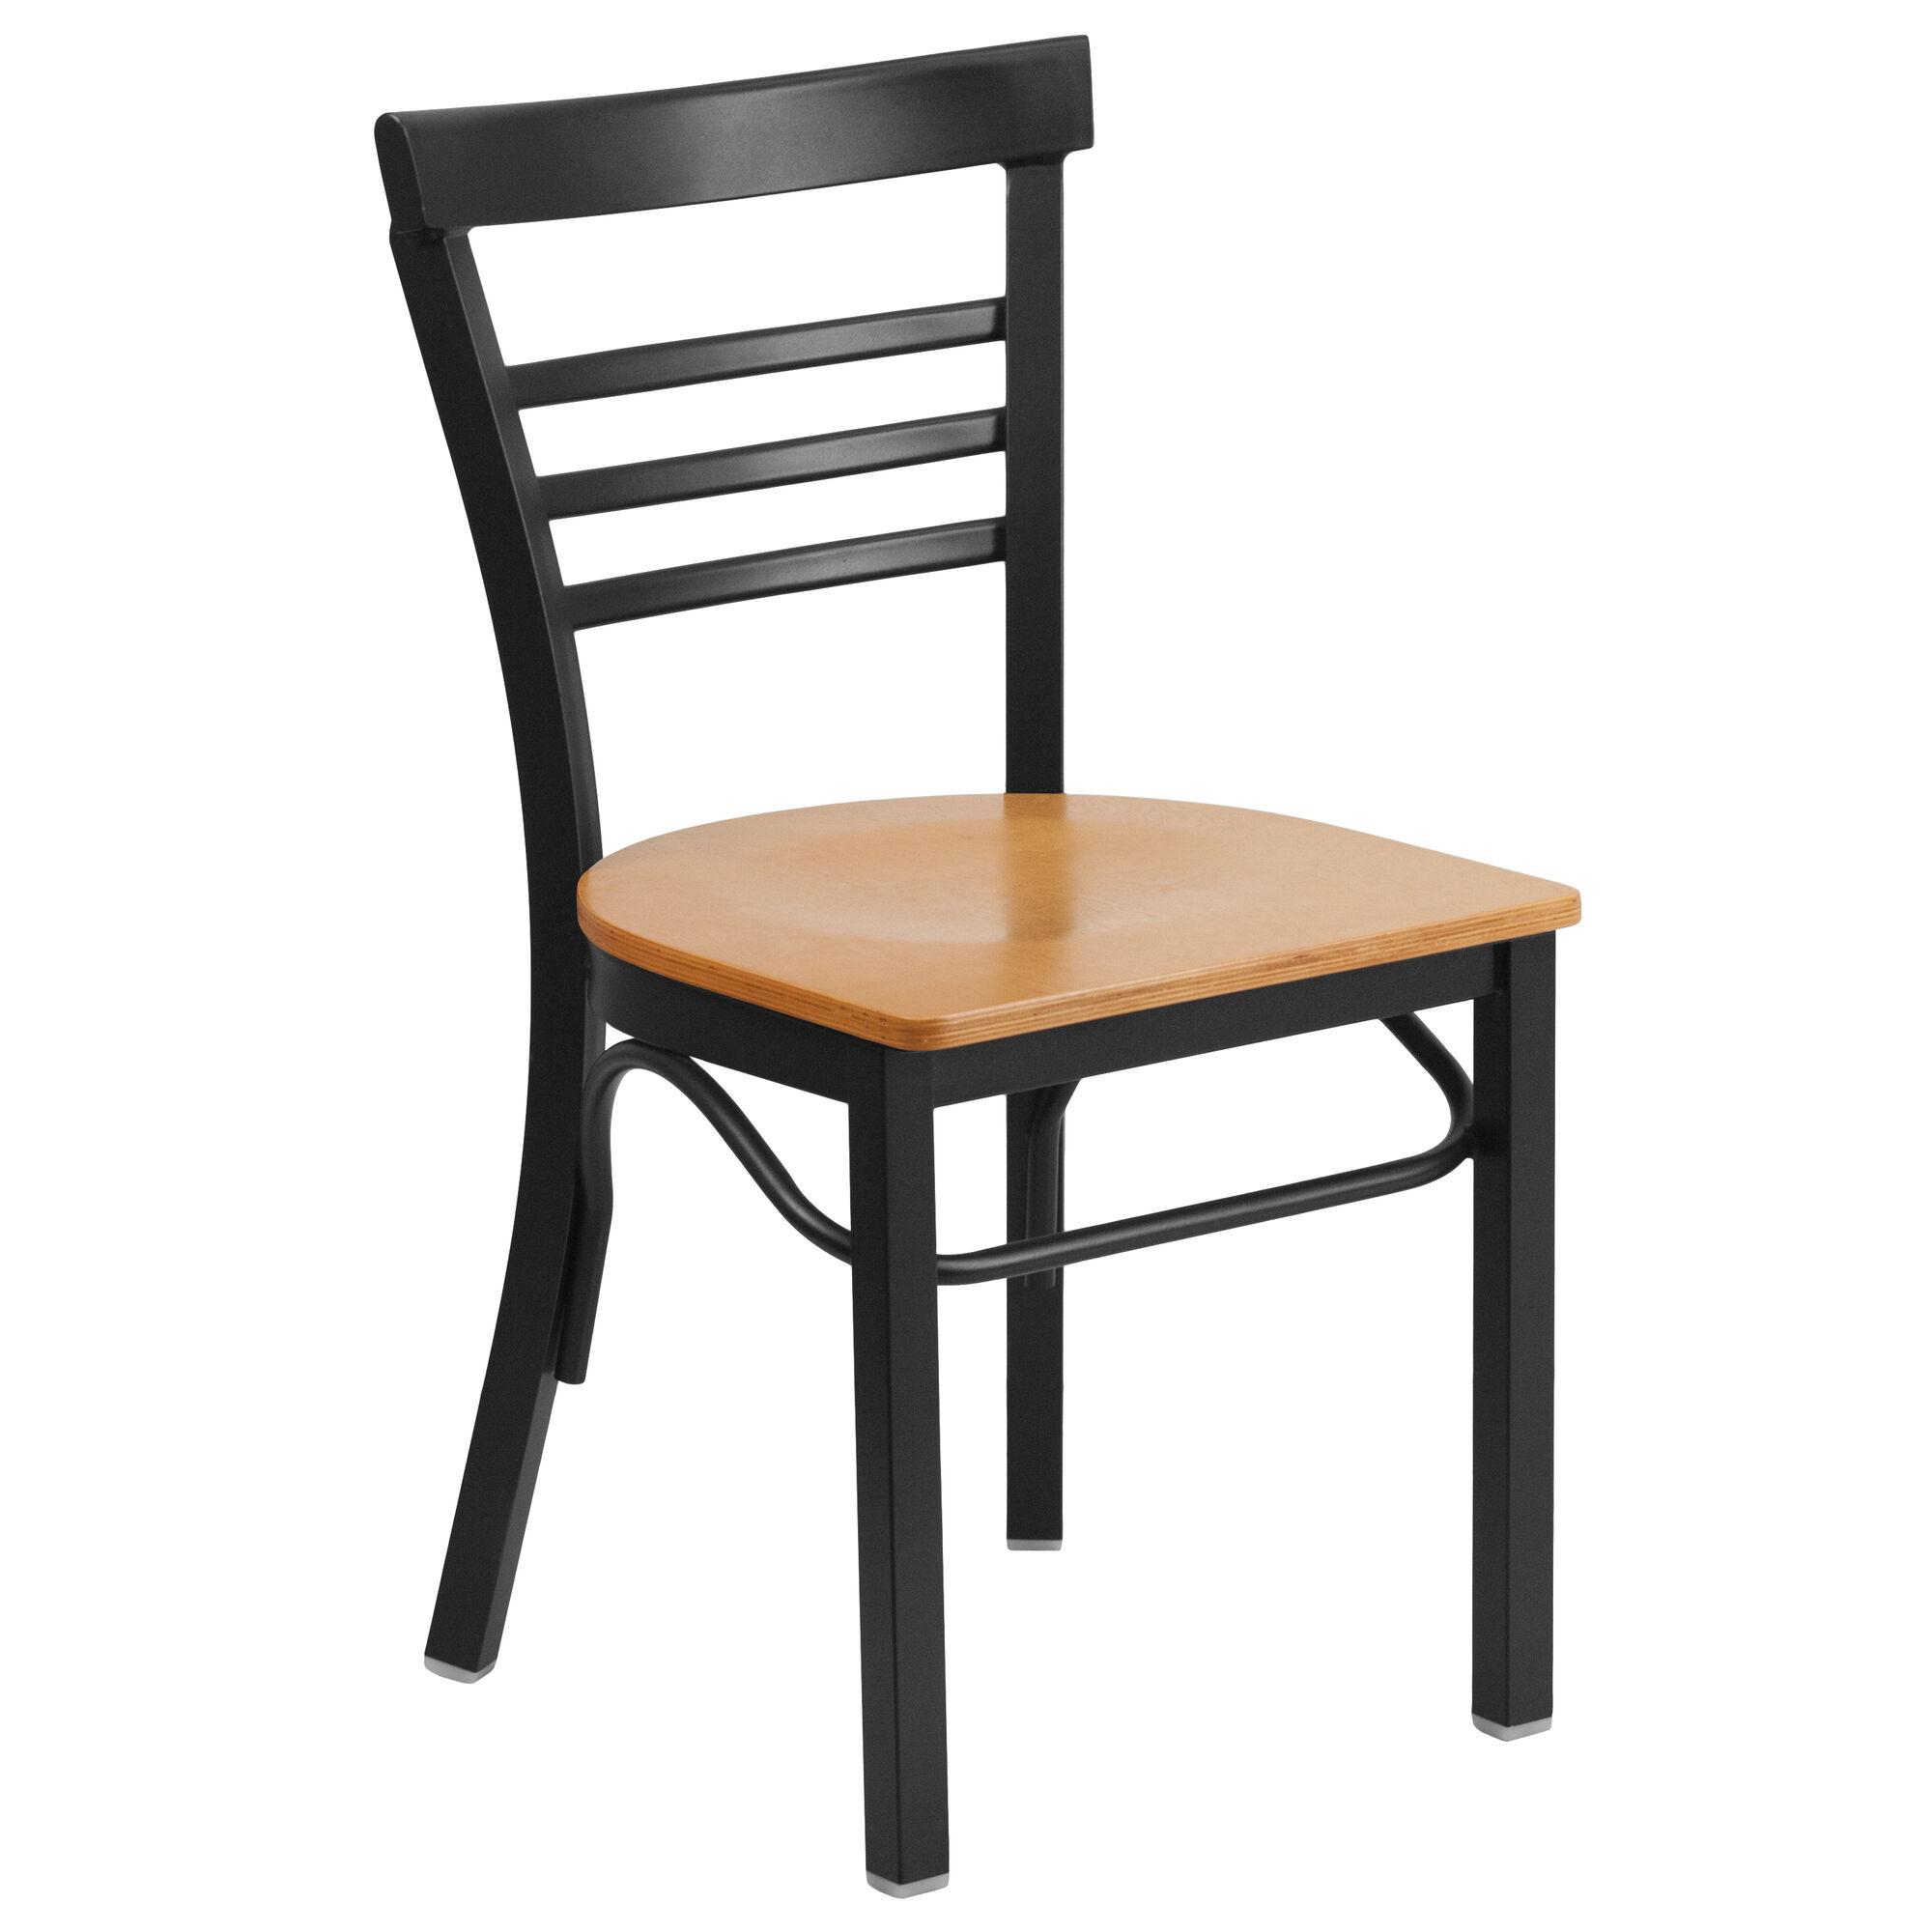 Black ladder chair nat seat bfdh bladnw tdr